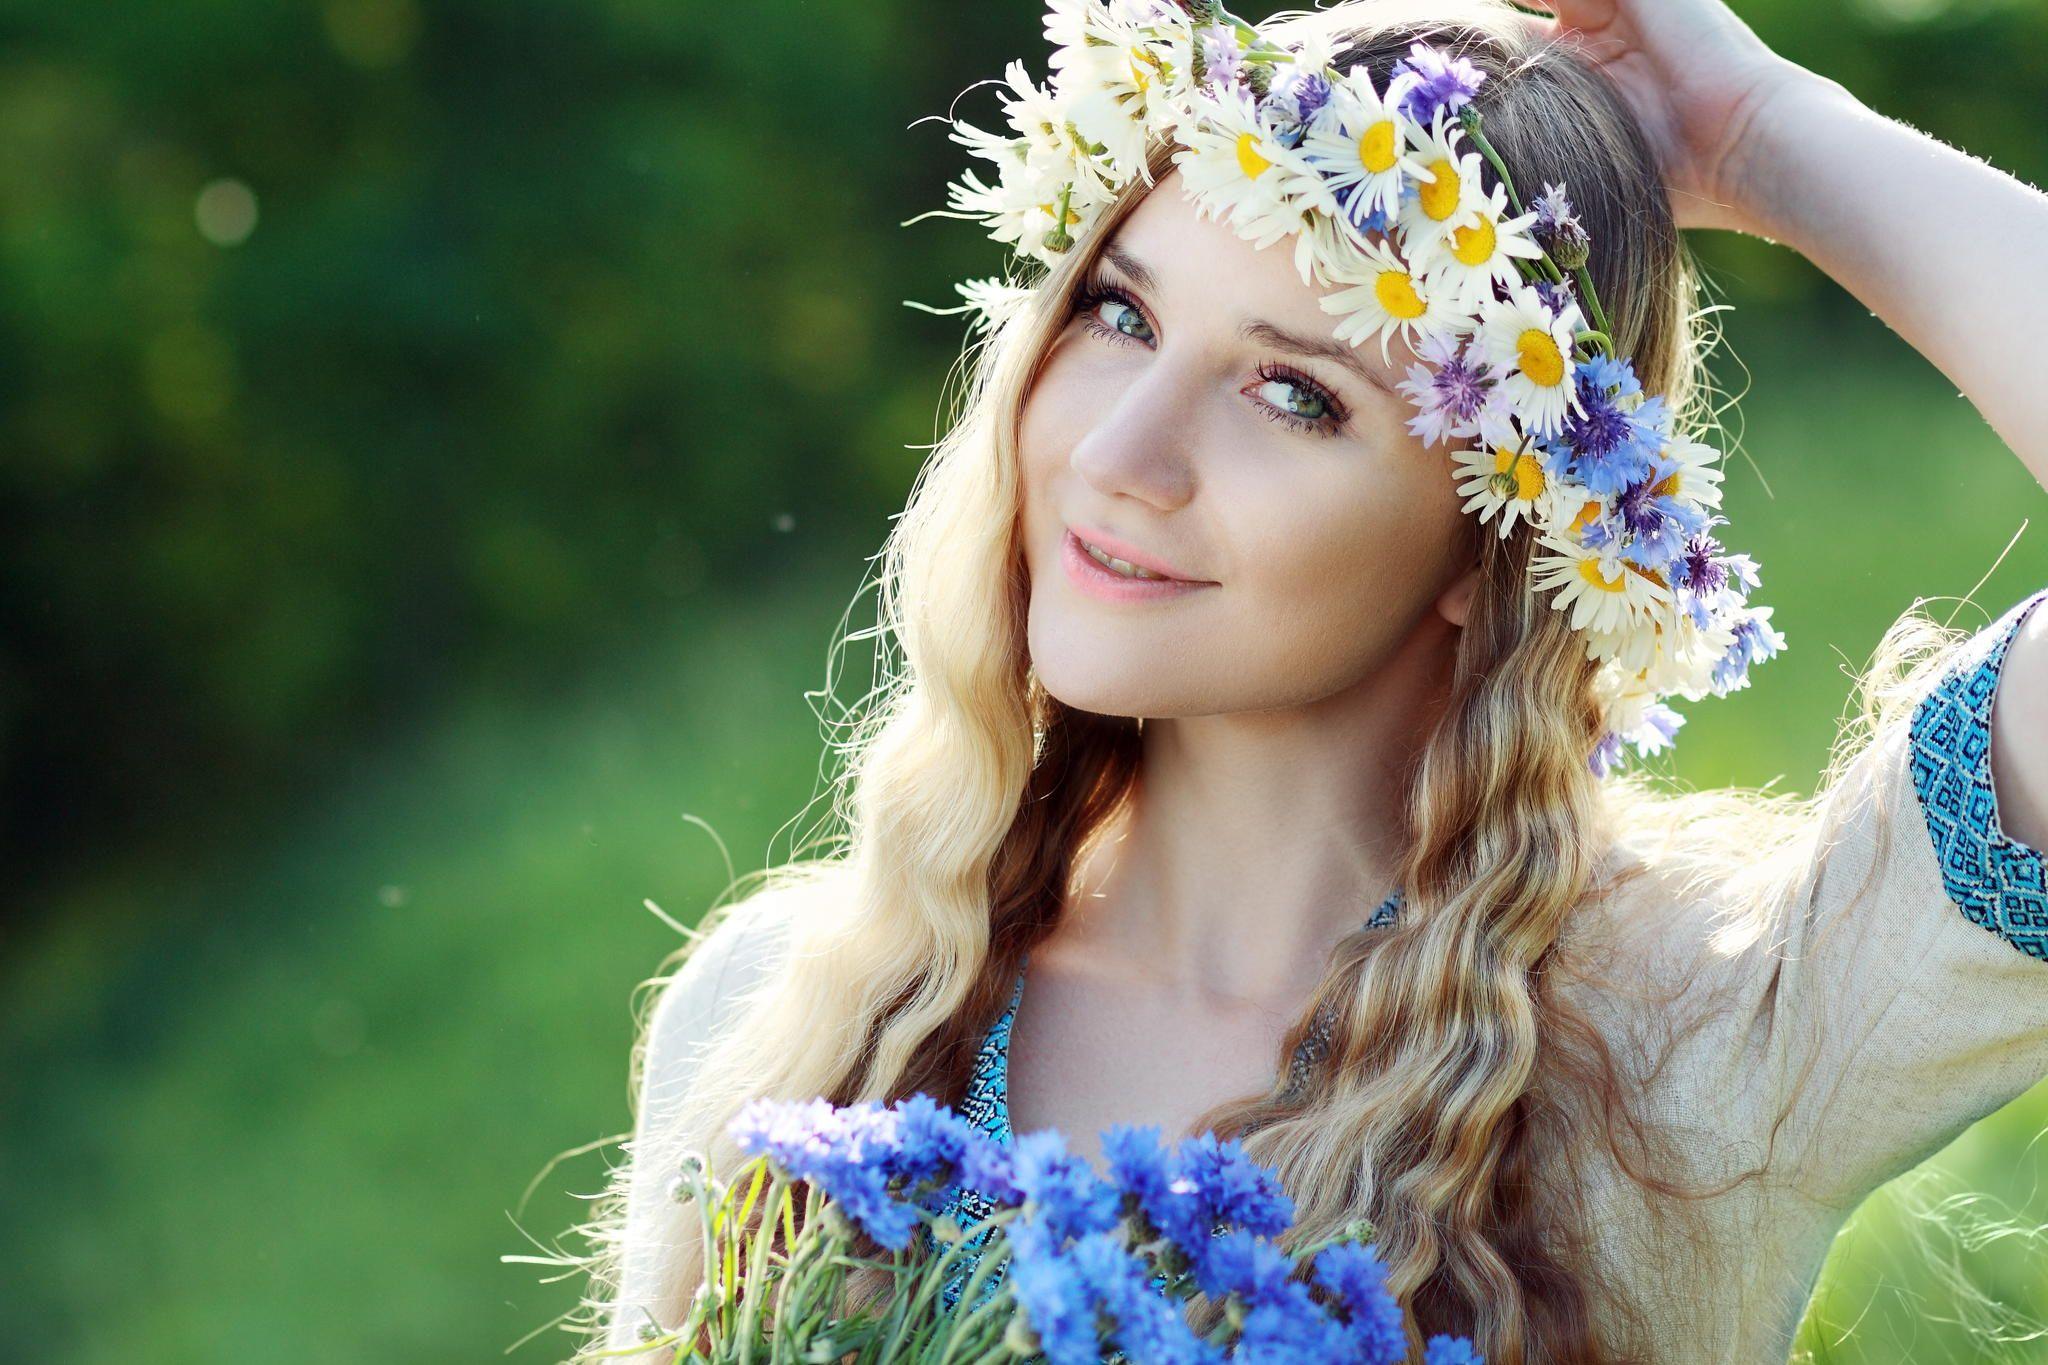 Beautiful ukrainian woman with flower wreath in fresh summer morning beautiful ukrainian woman with flower wreath in fresh summer morning izmirmasajfo